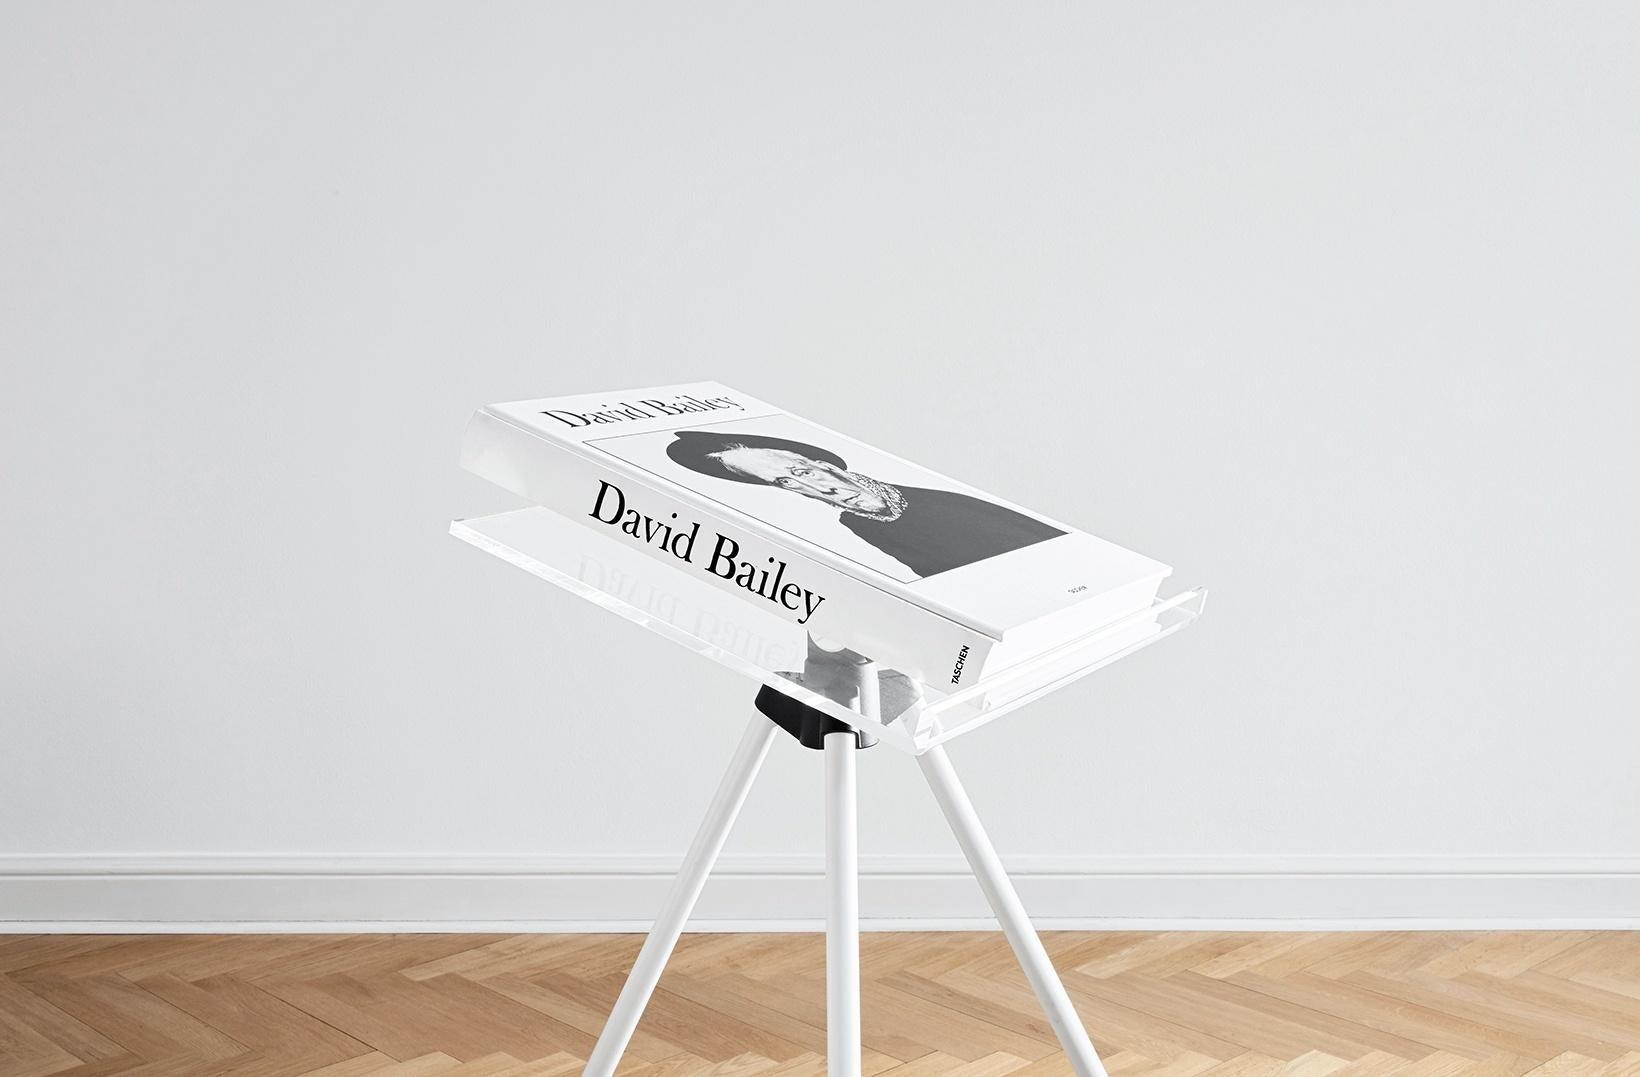 David Bailey SUMO Art Edition Book by TASCHEN